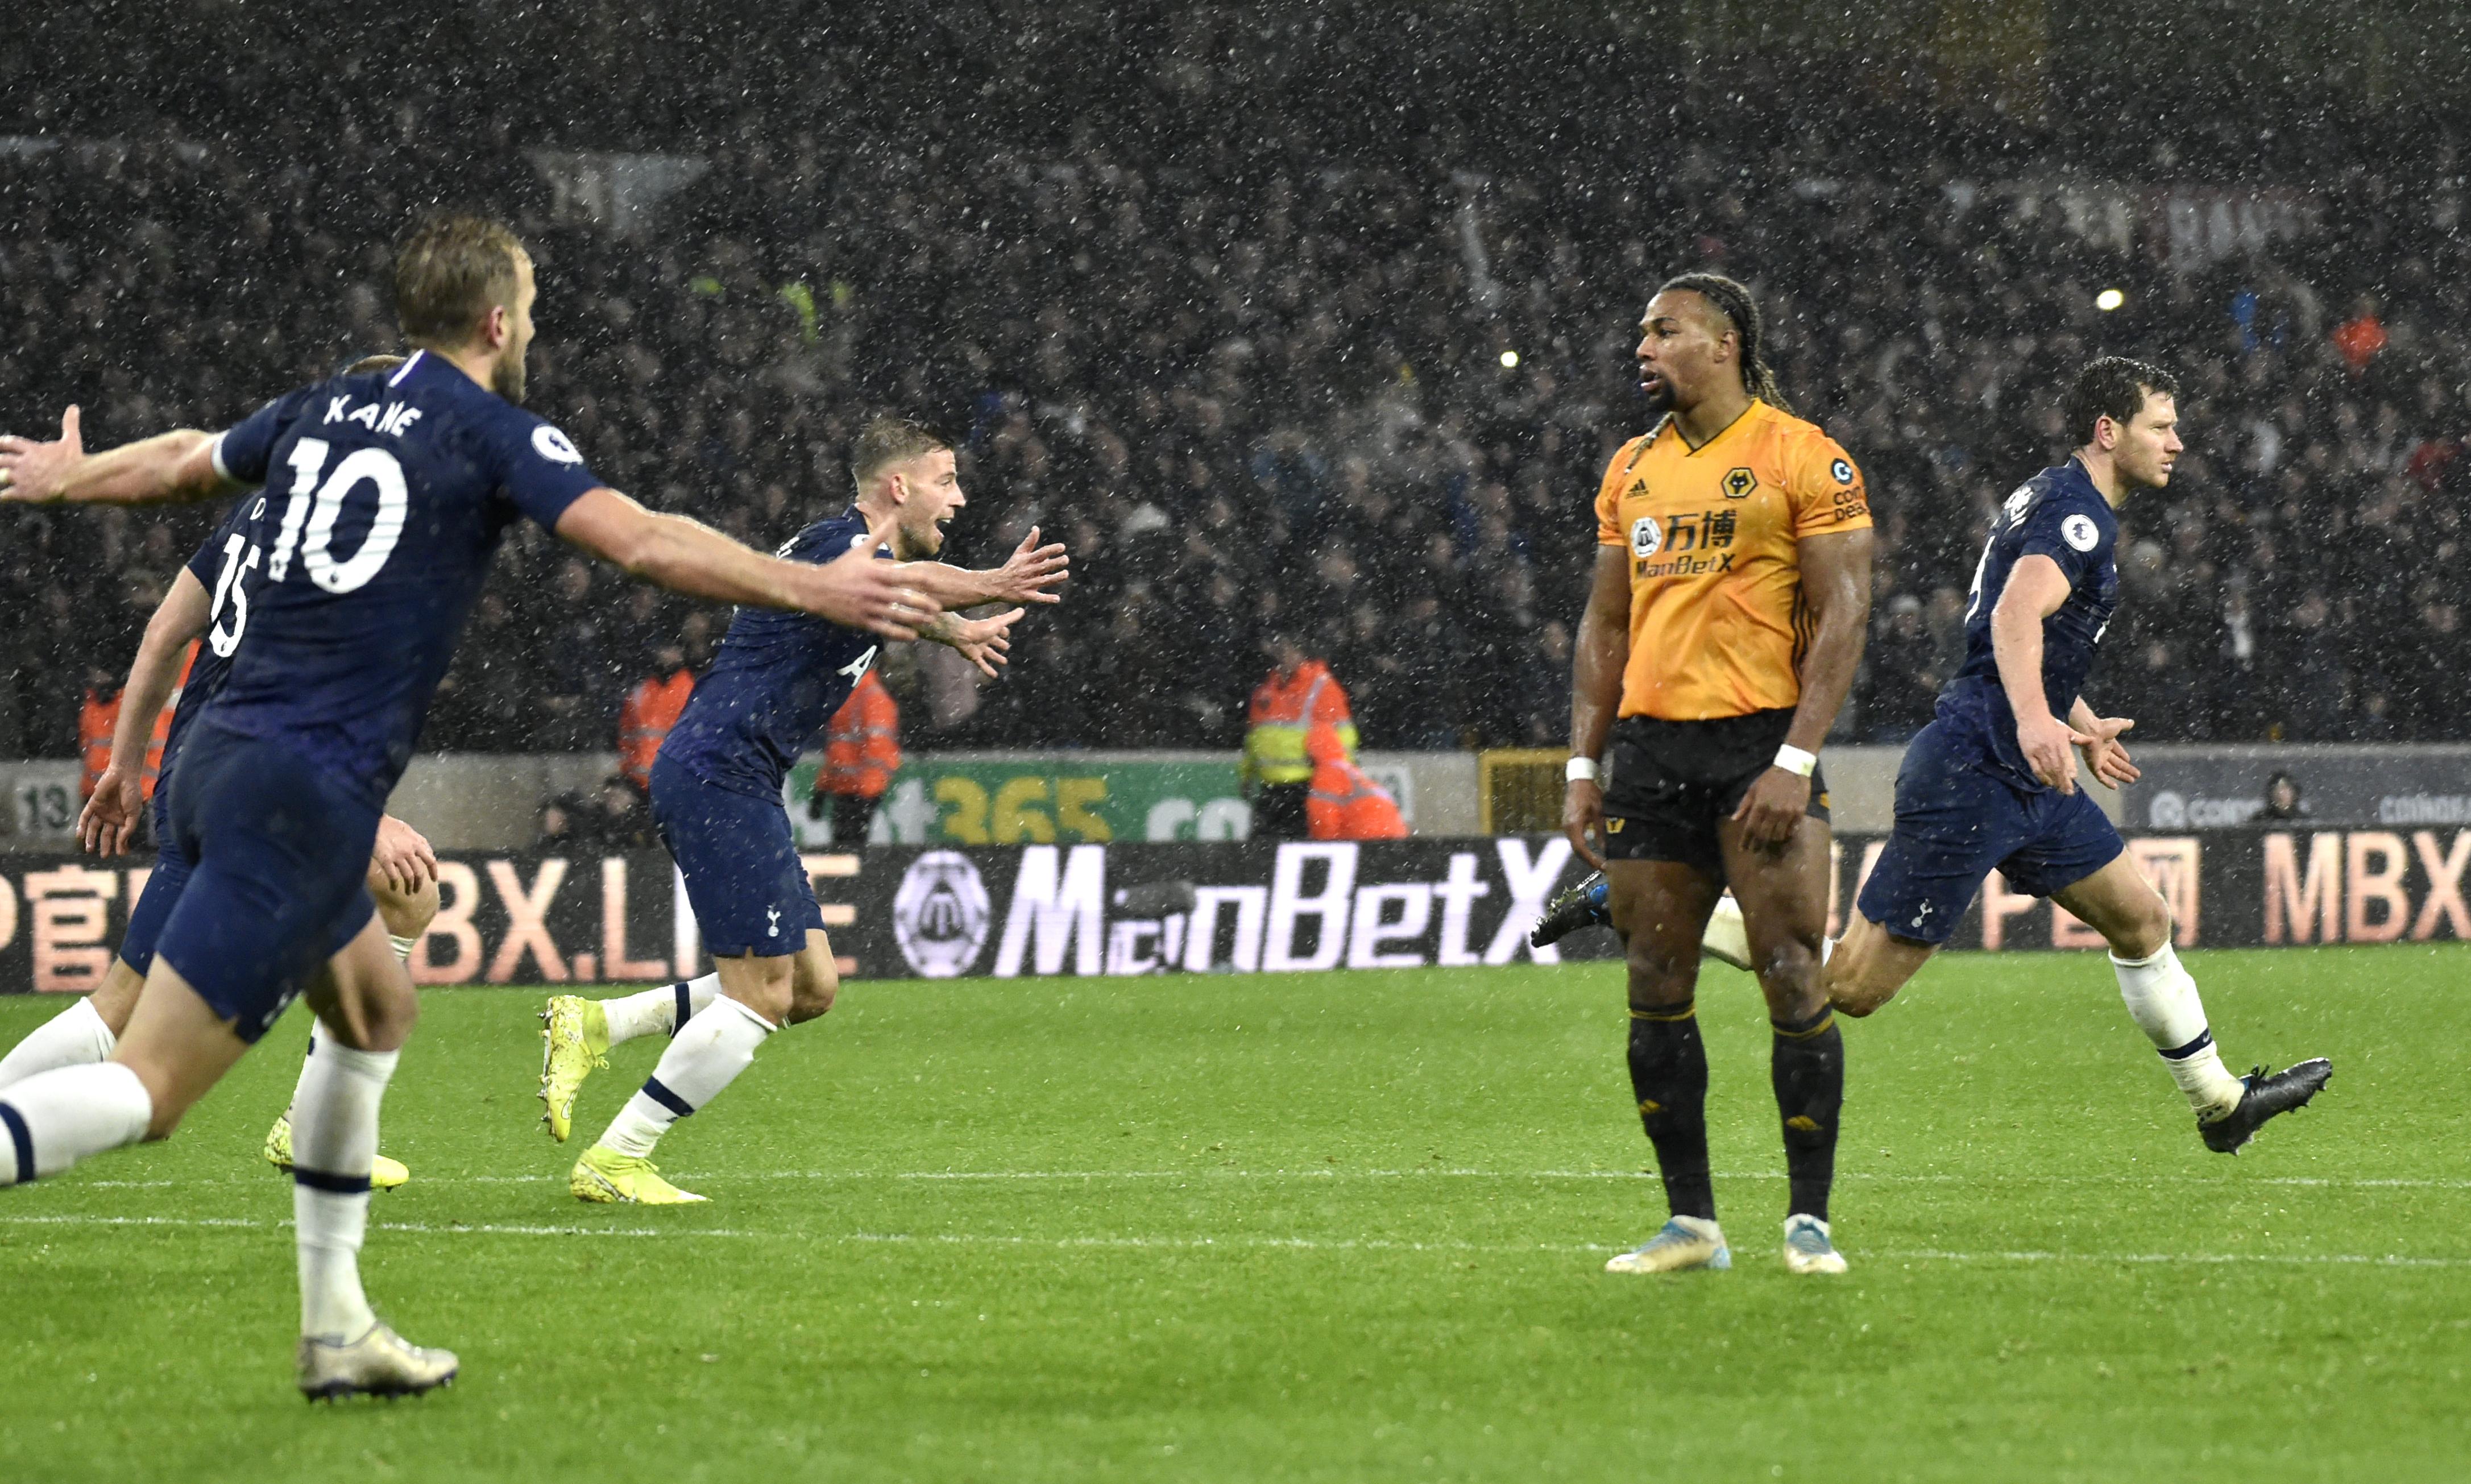 Vertonghen heads Tottenham to 2-1 win at Wolves